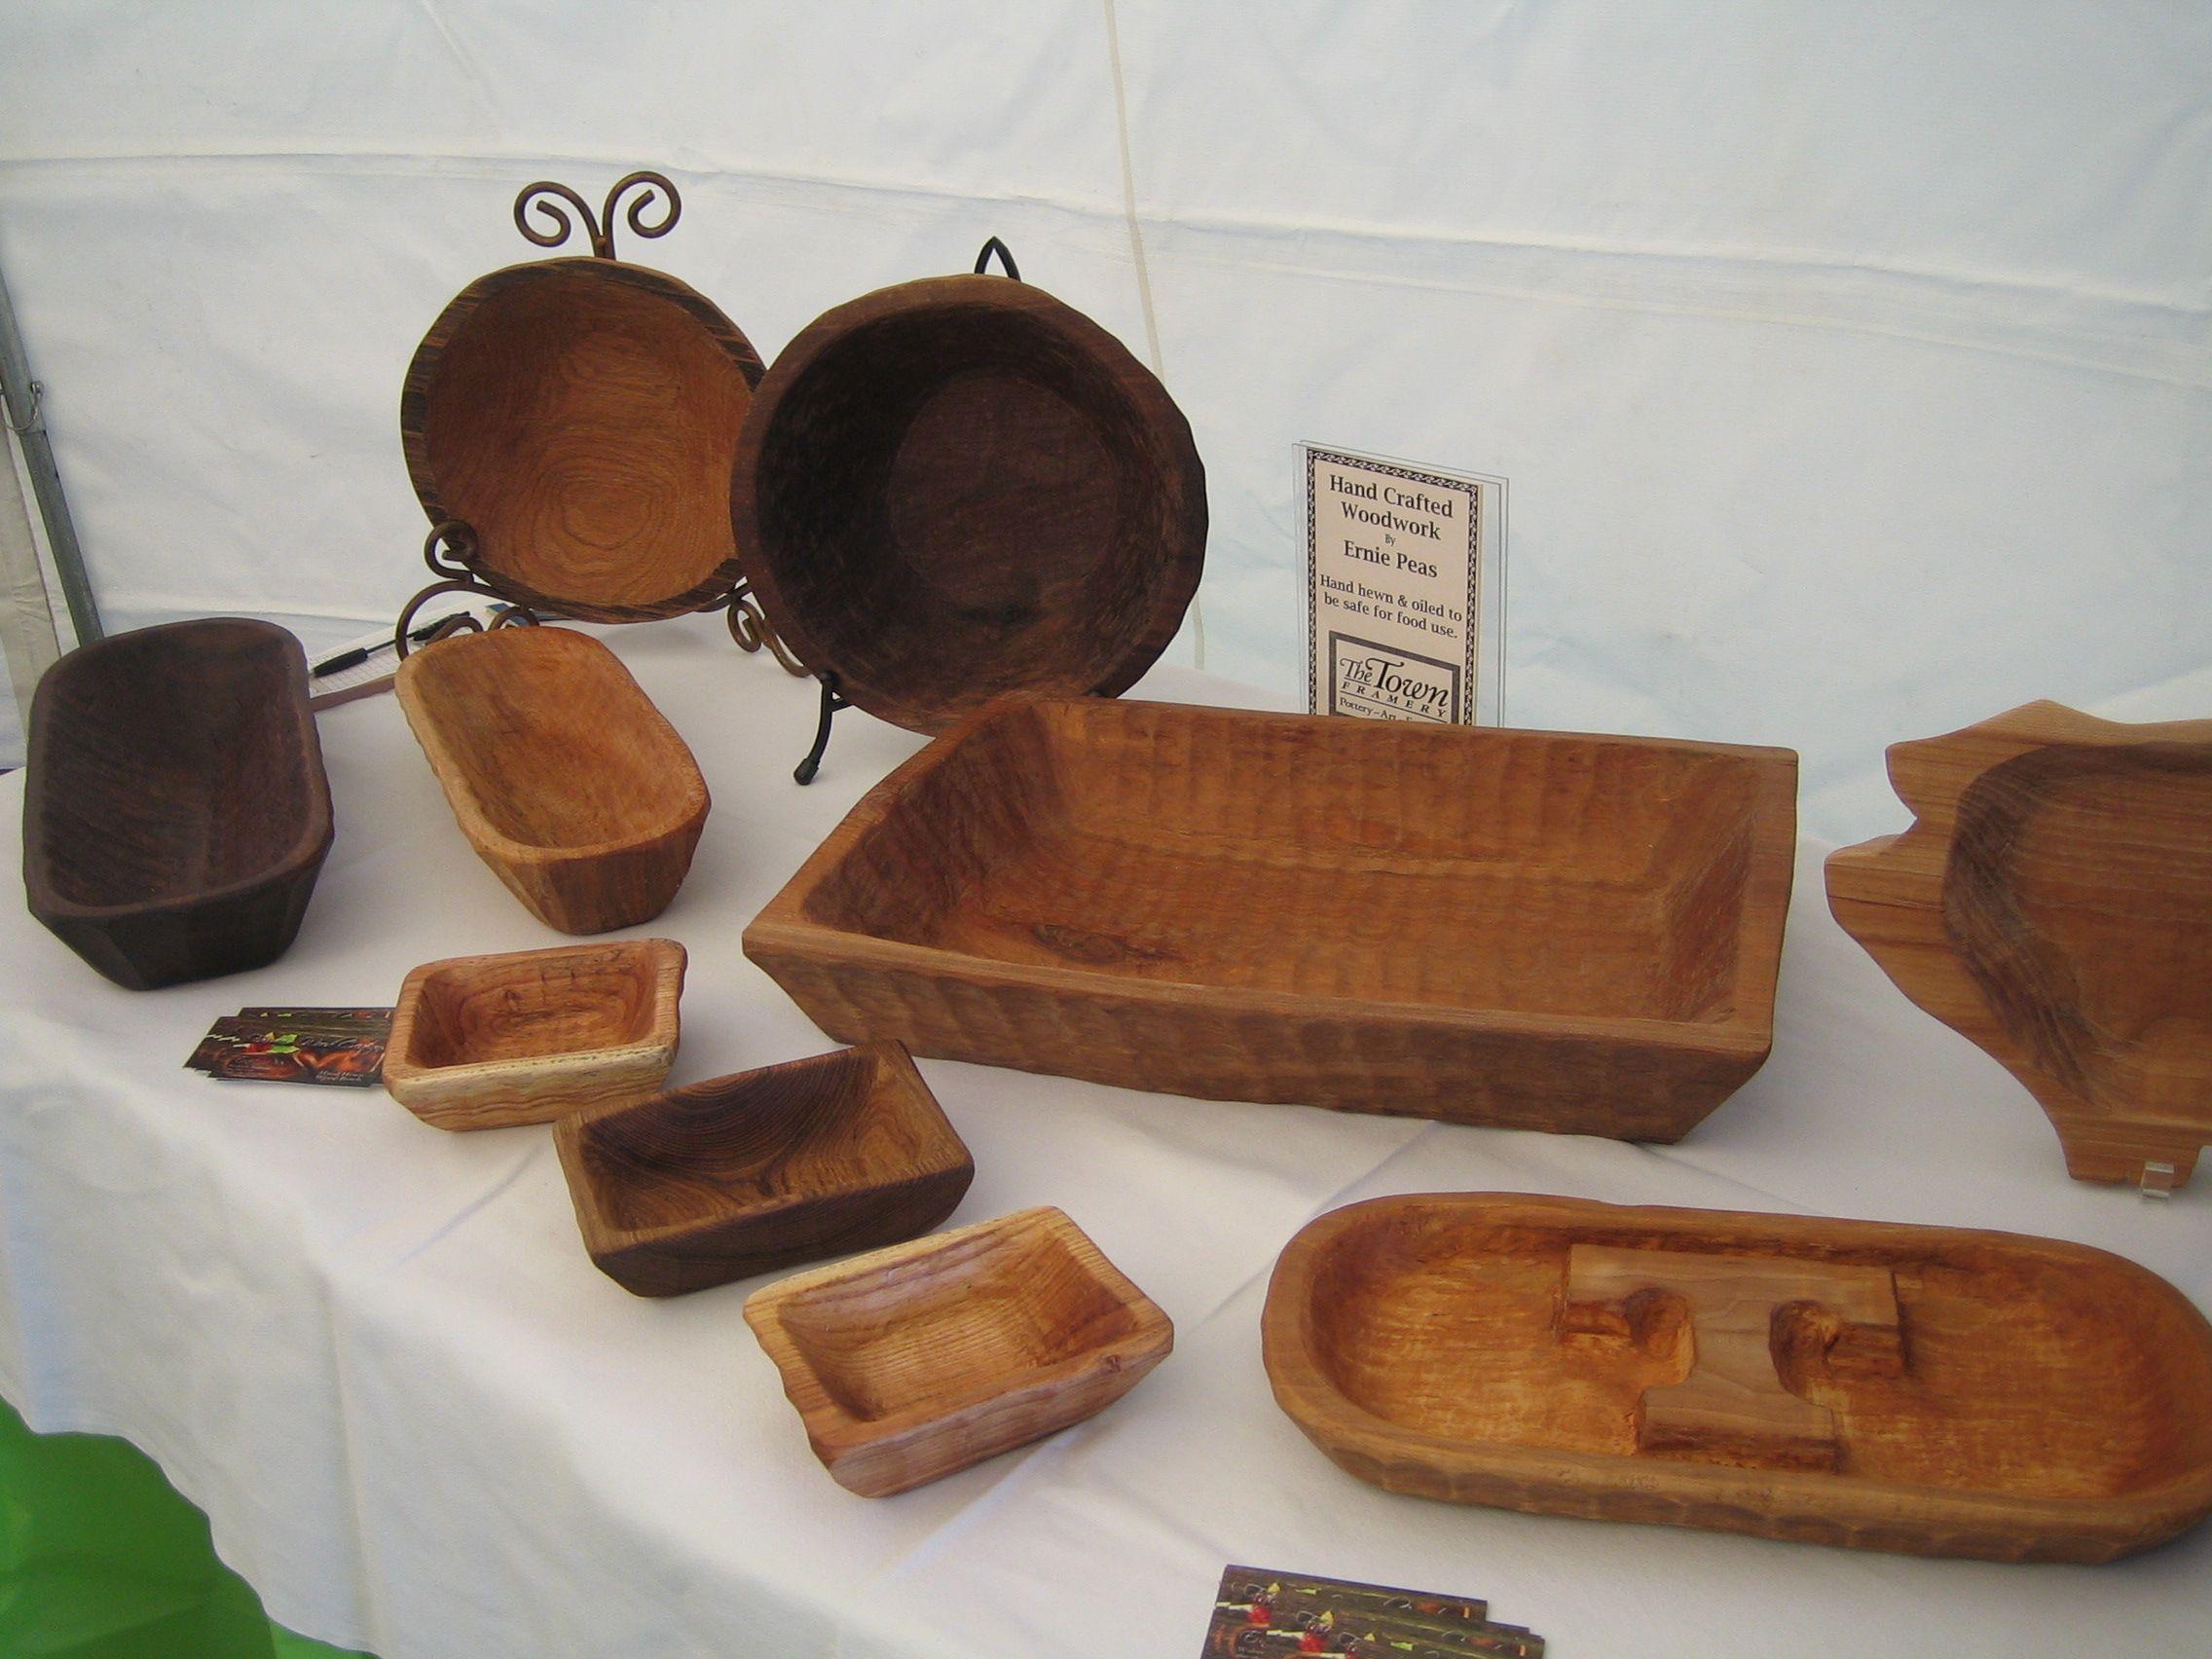 Ernie peas handcrafted wood work hand hewn oiled